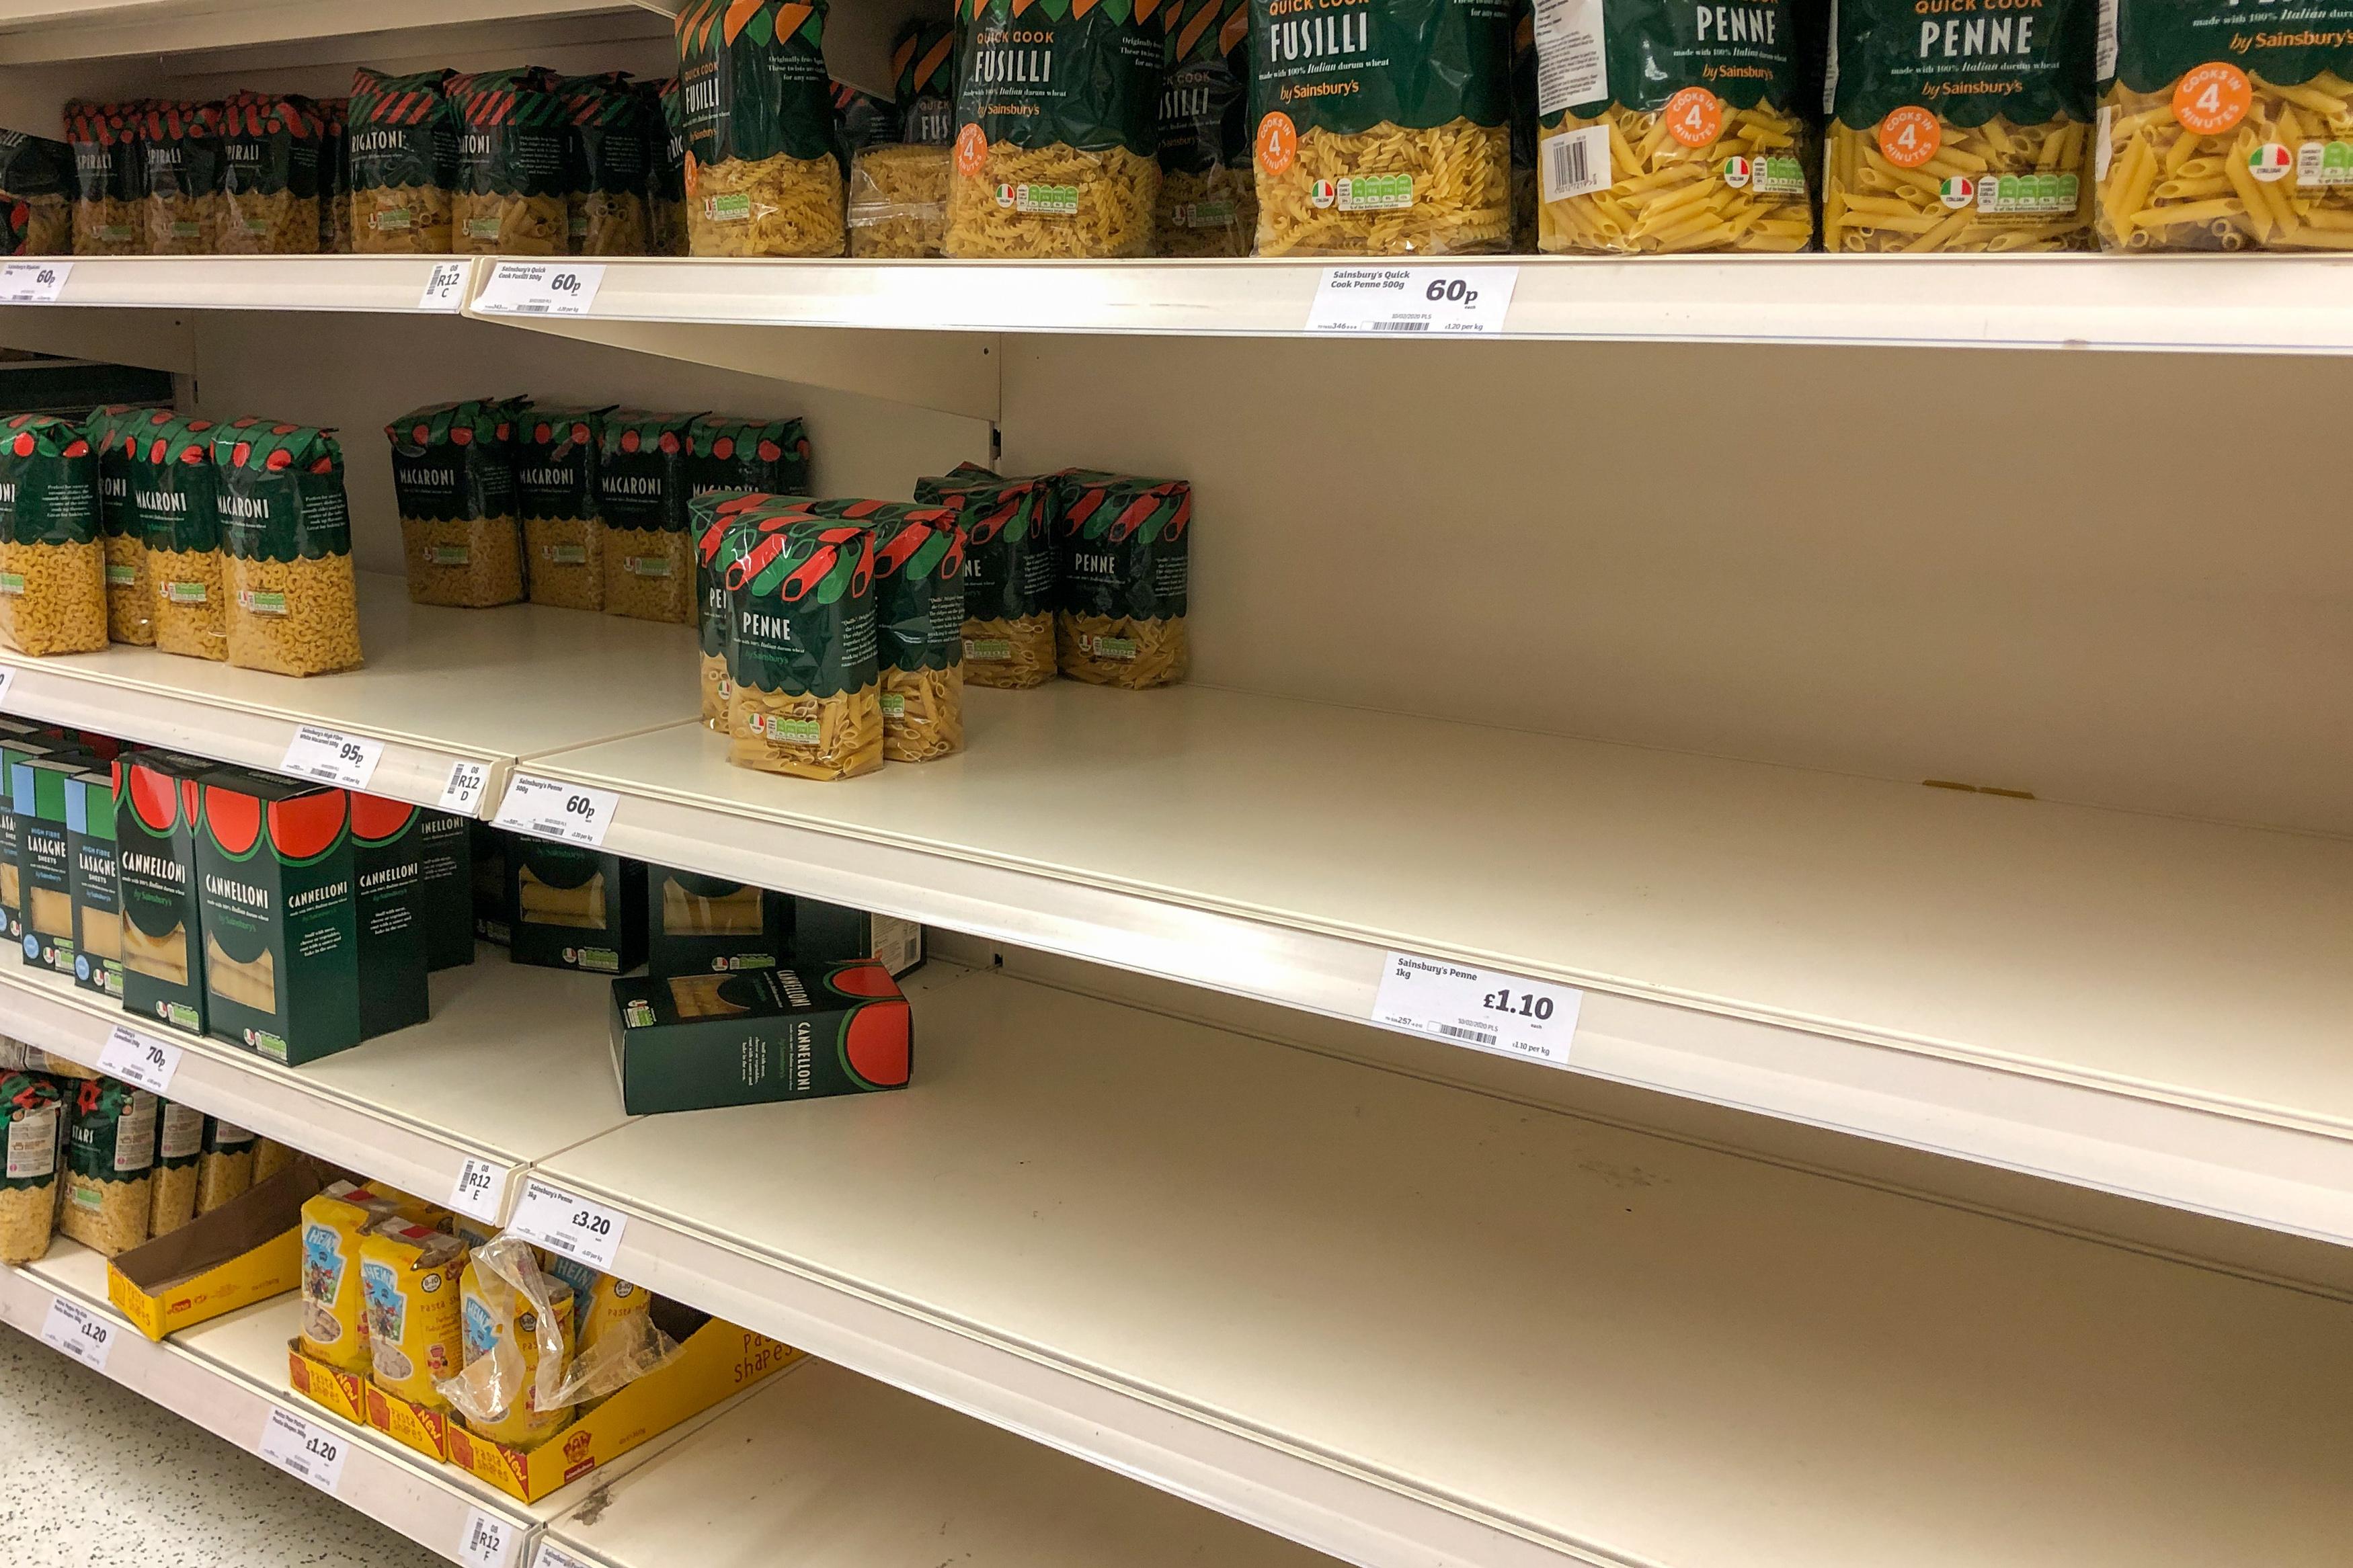 A shortage of pasta on the shelves at a Sainsbury's supermarket in Cambridge, as Prime Minister Boris Johnson announces the government's coronavirus action plan.